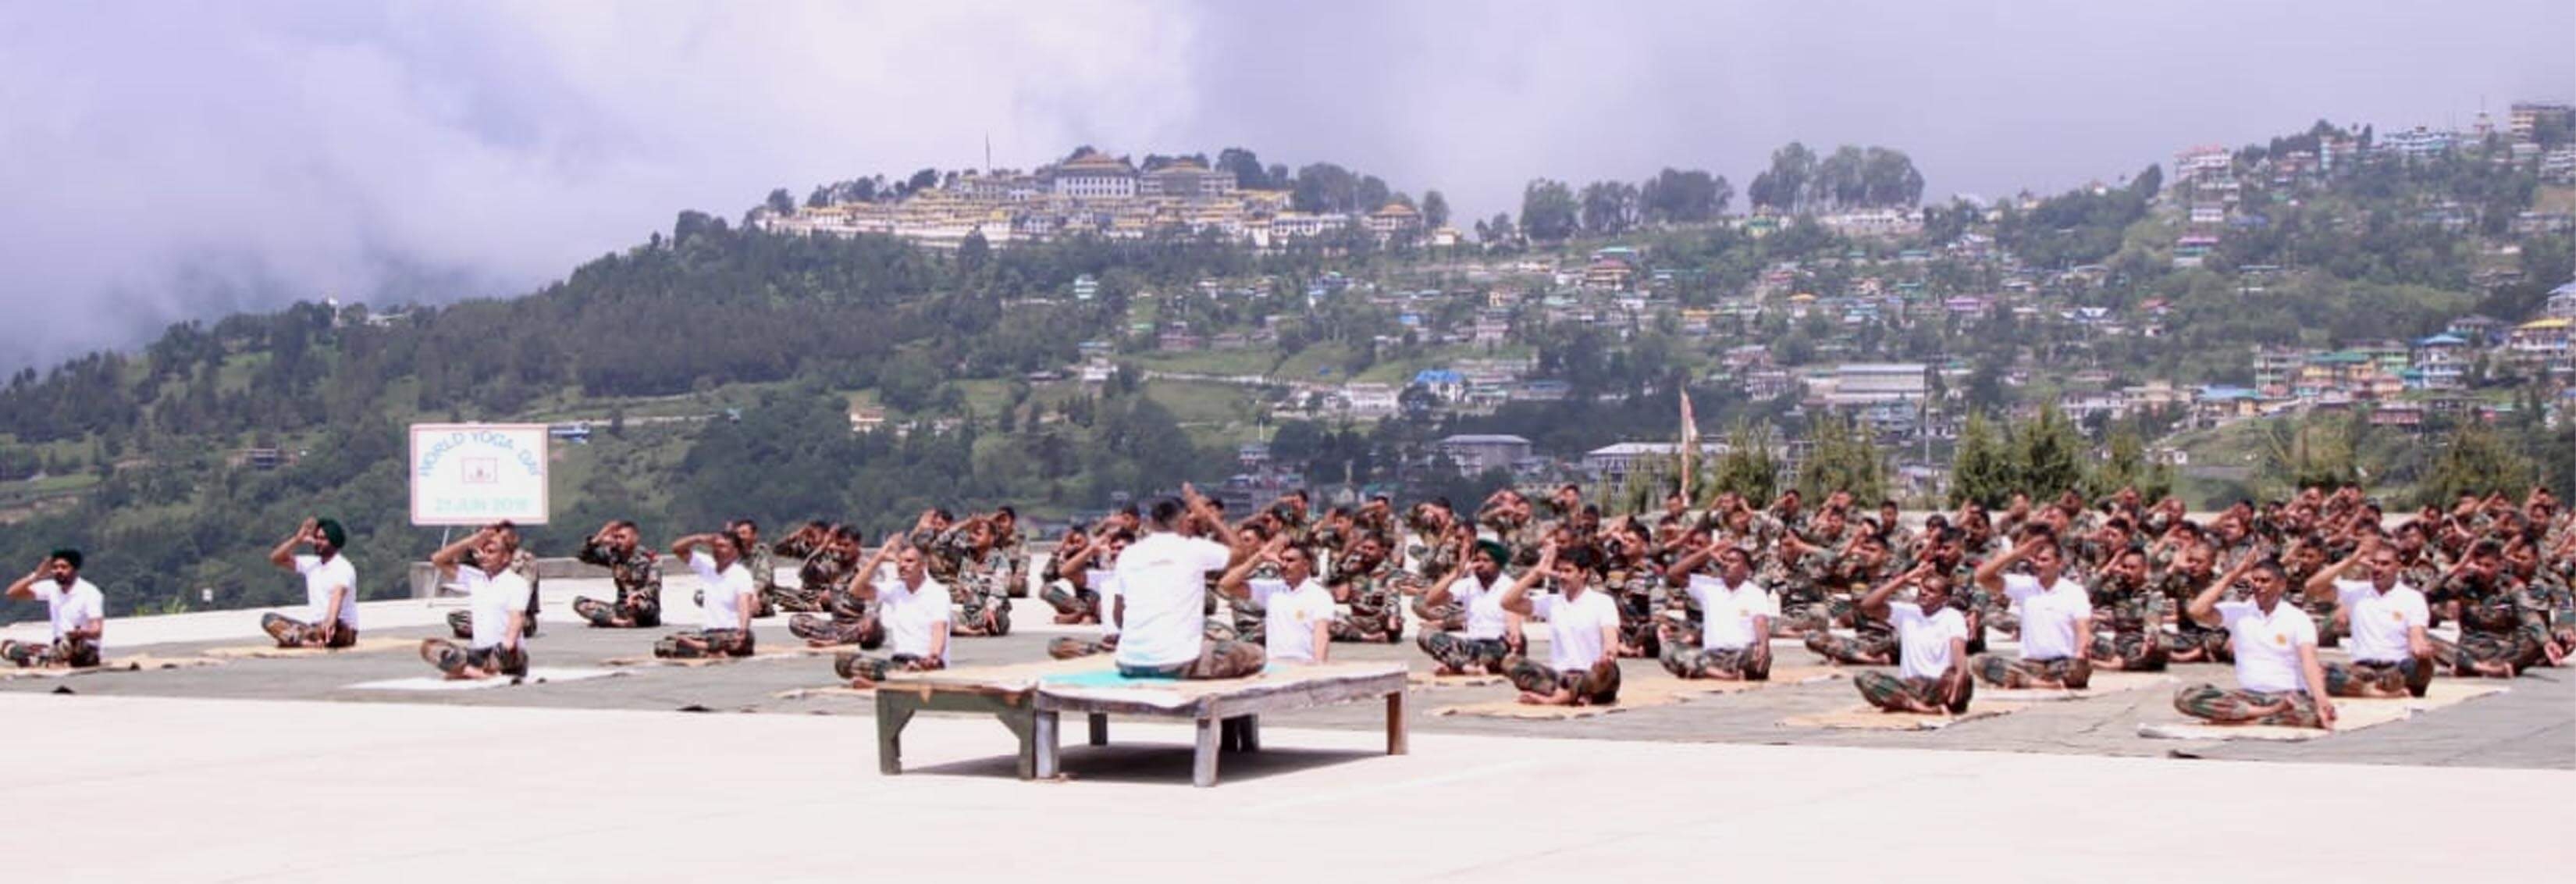 Arunachal celebrates International Yoga Day